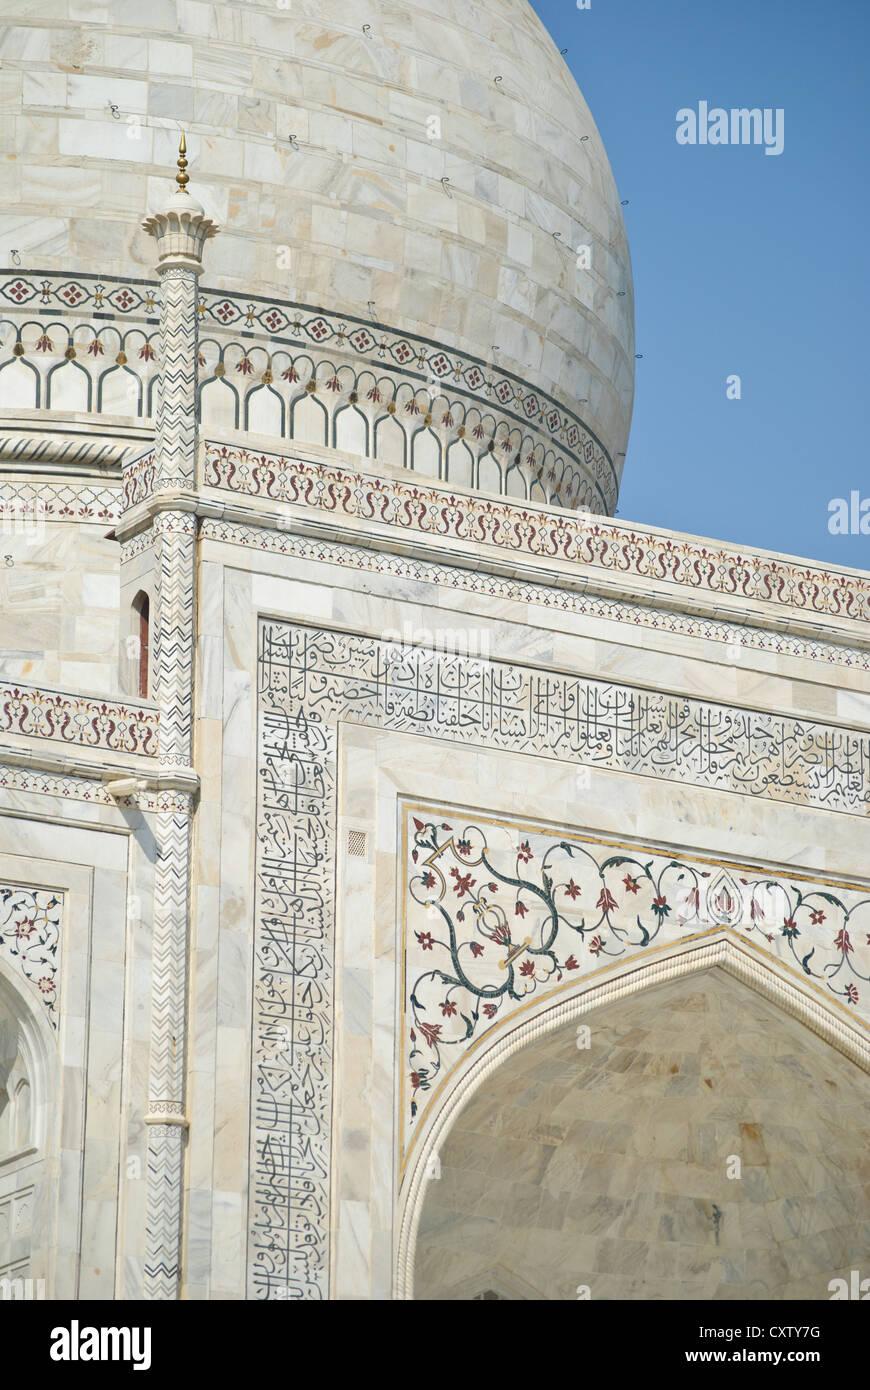 Marble Inlay Work Of The Famous Taj Mahal Stock Photo